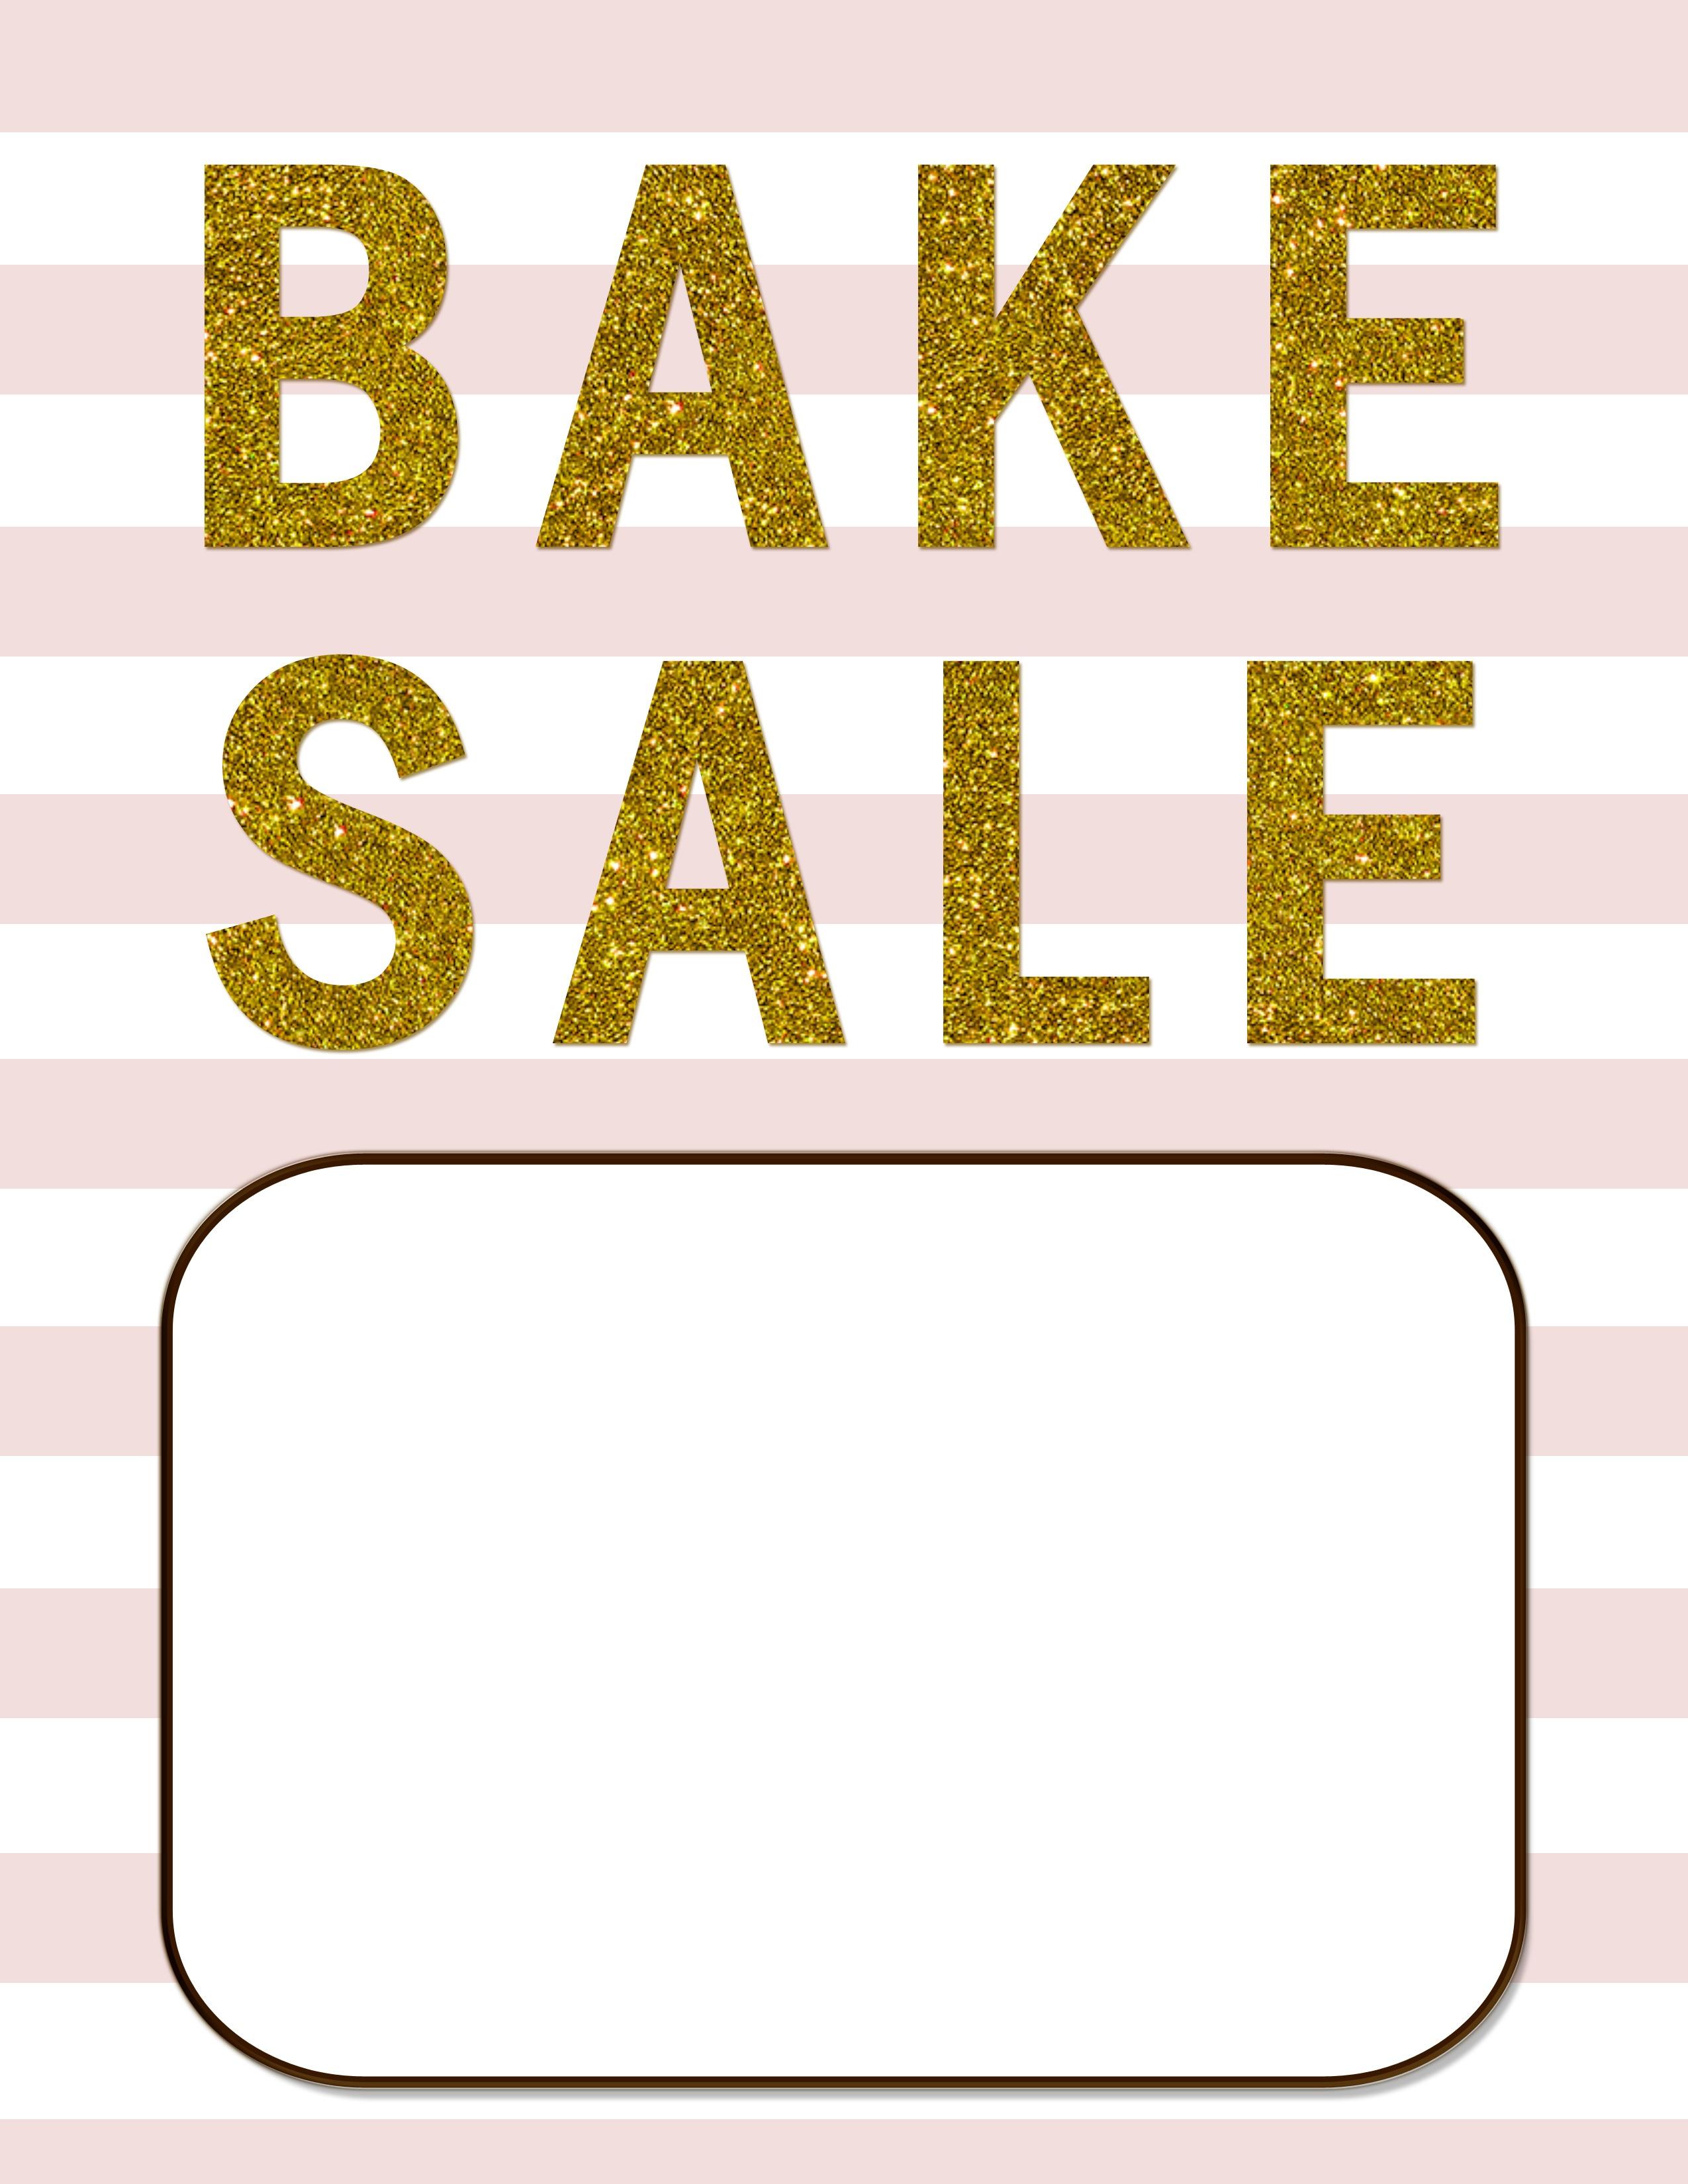 Bake Sale Flyers – Free Flyer Designs - Create Free Printable Flyer